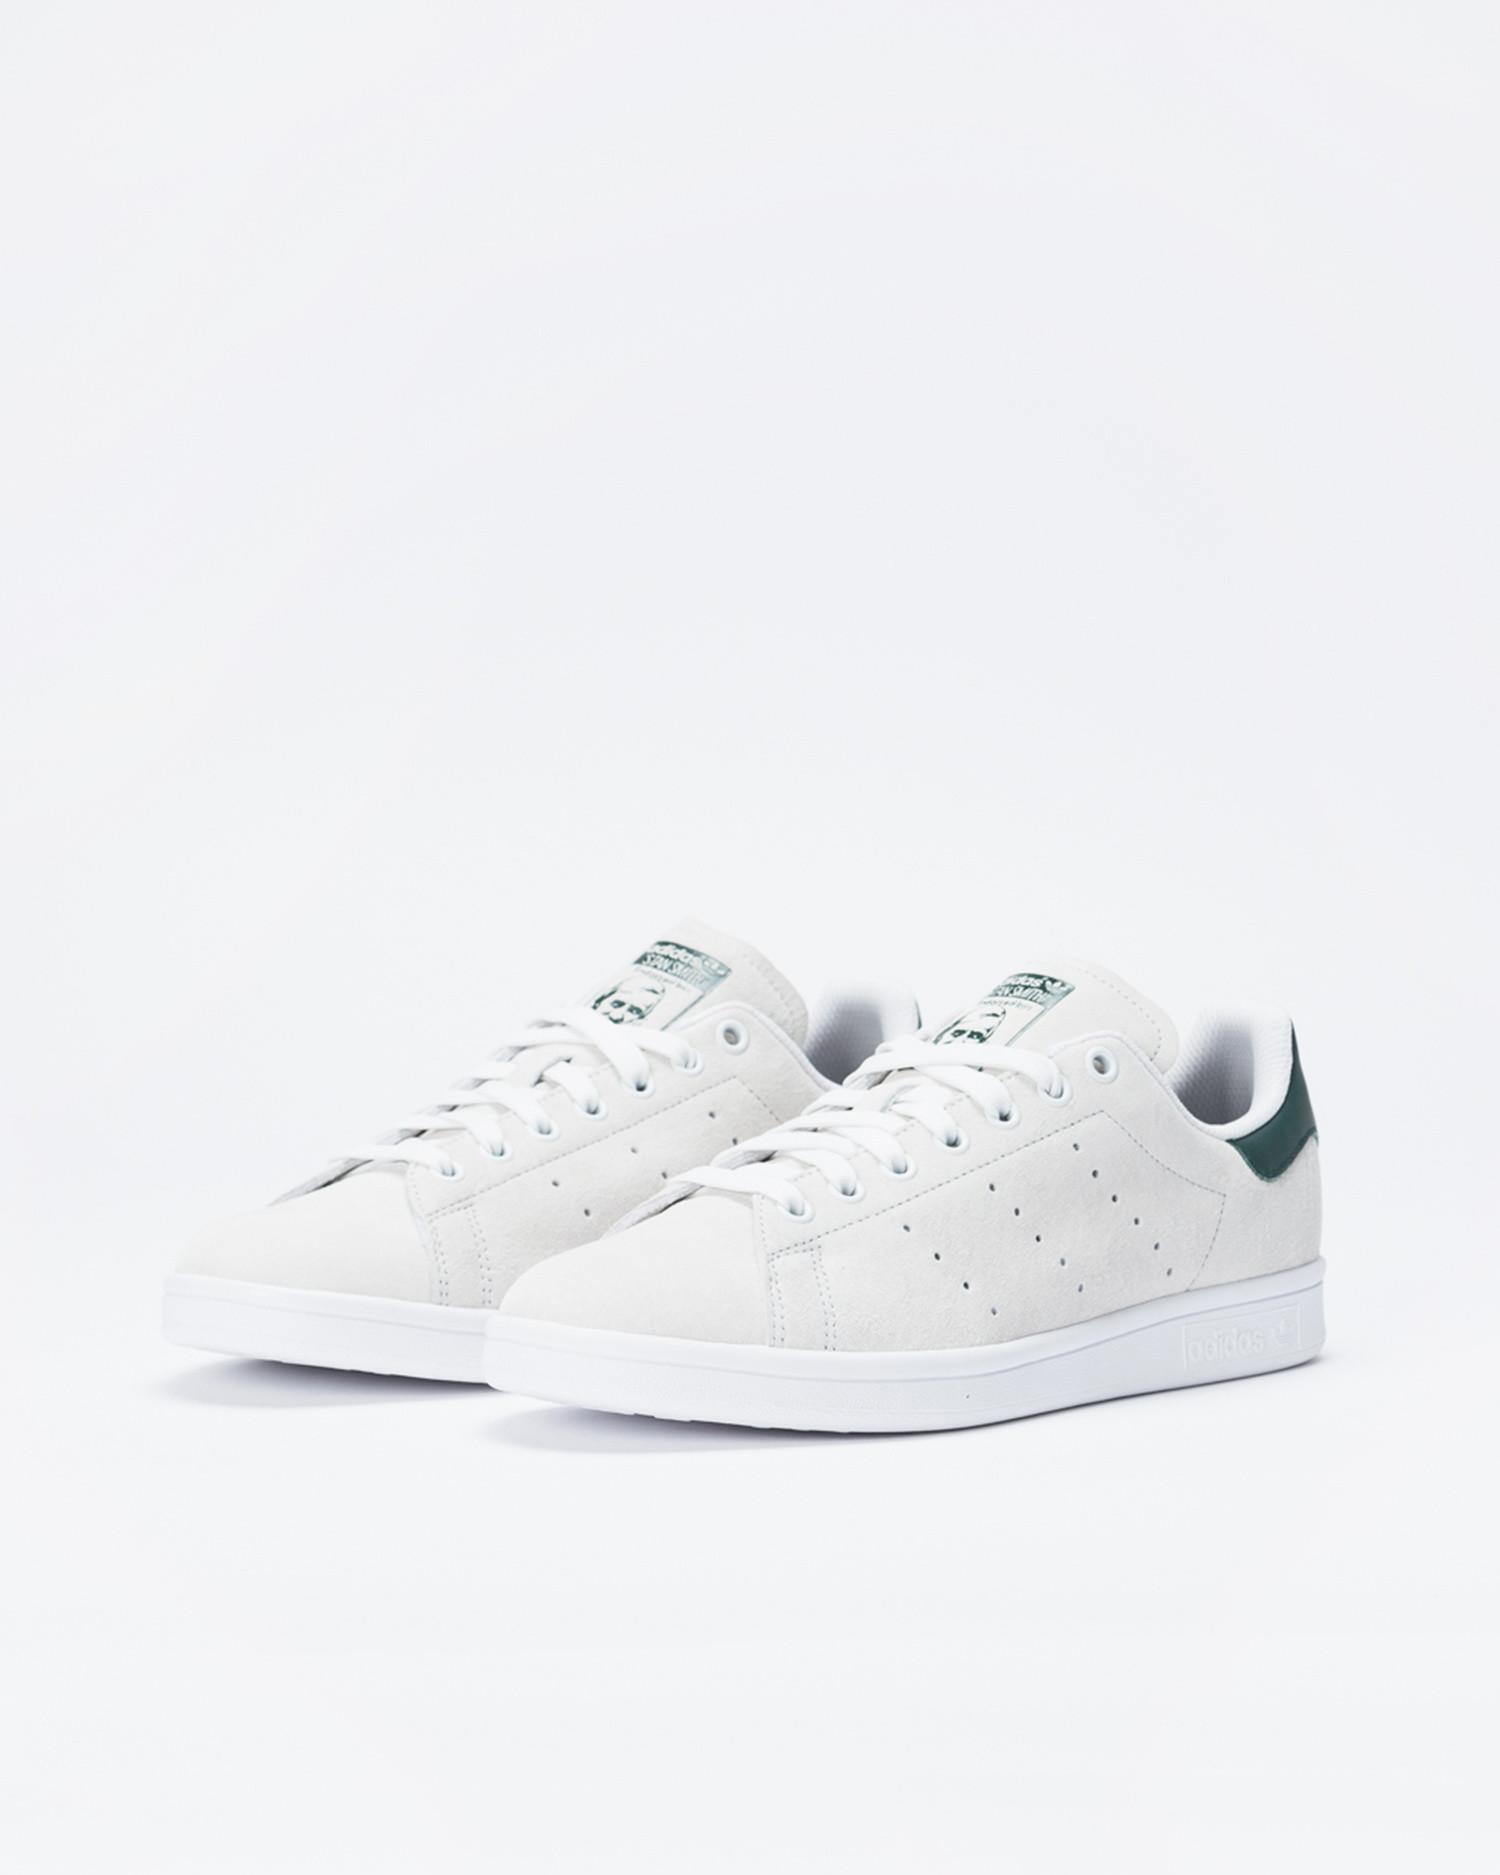 Adidas Stan Smith Adv Crywht/Mingre/Ftwwht